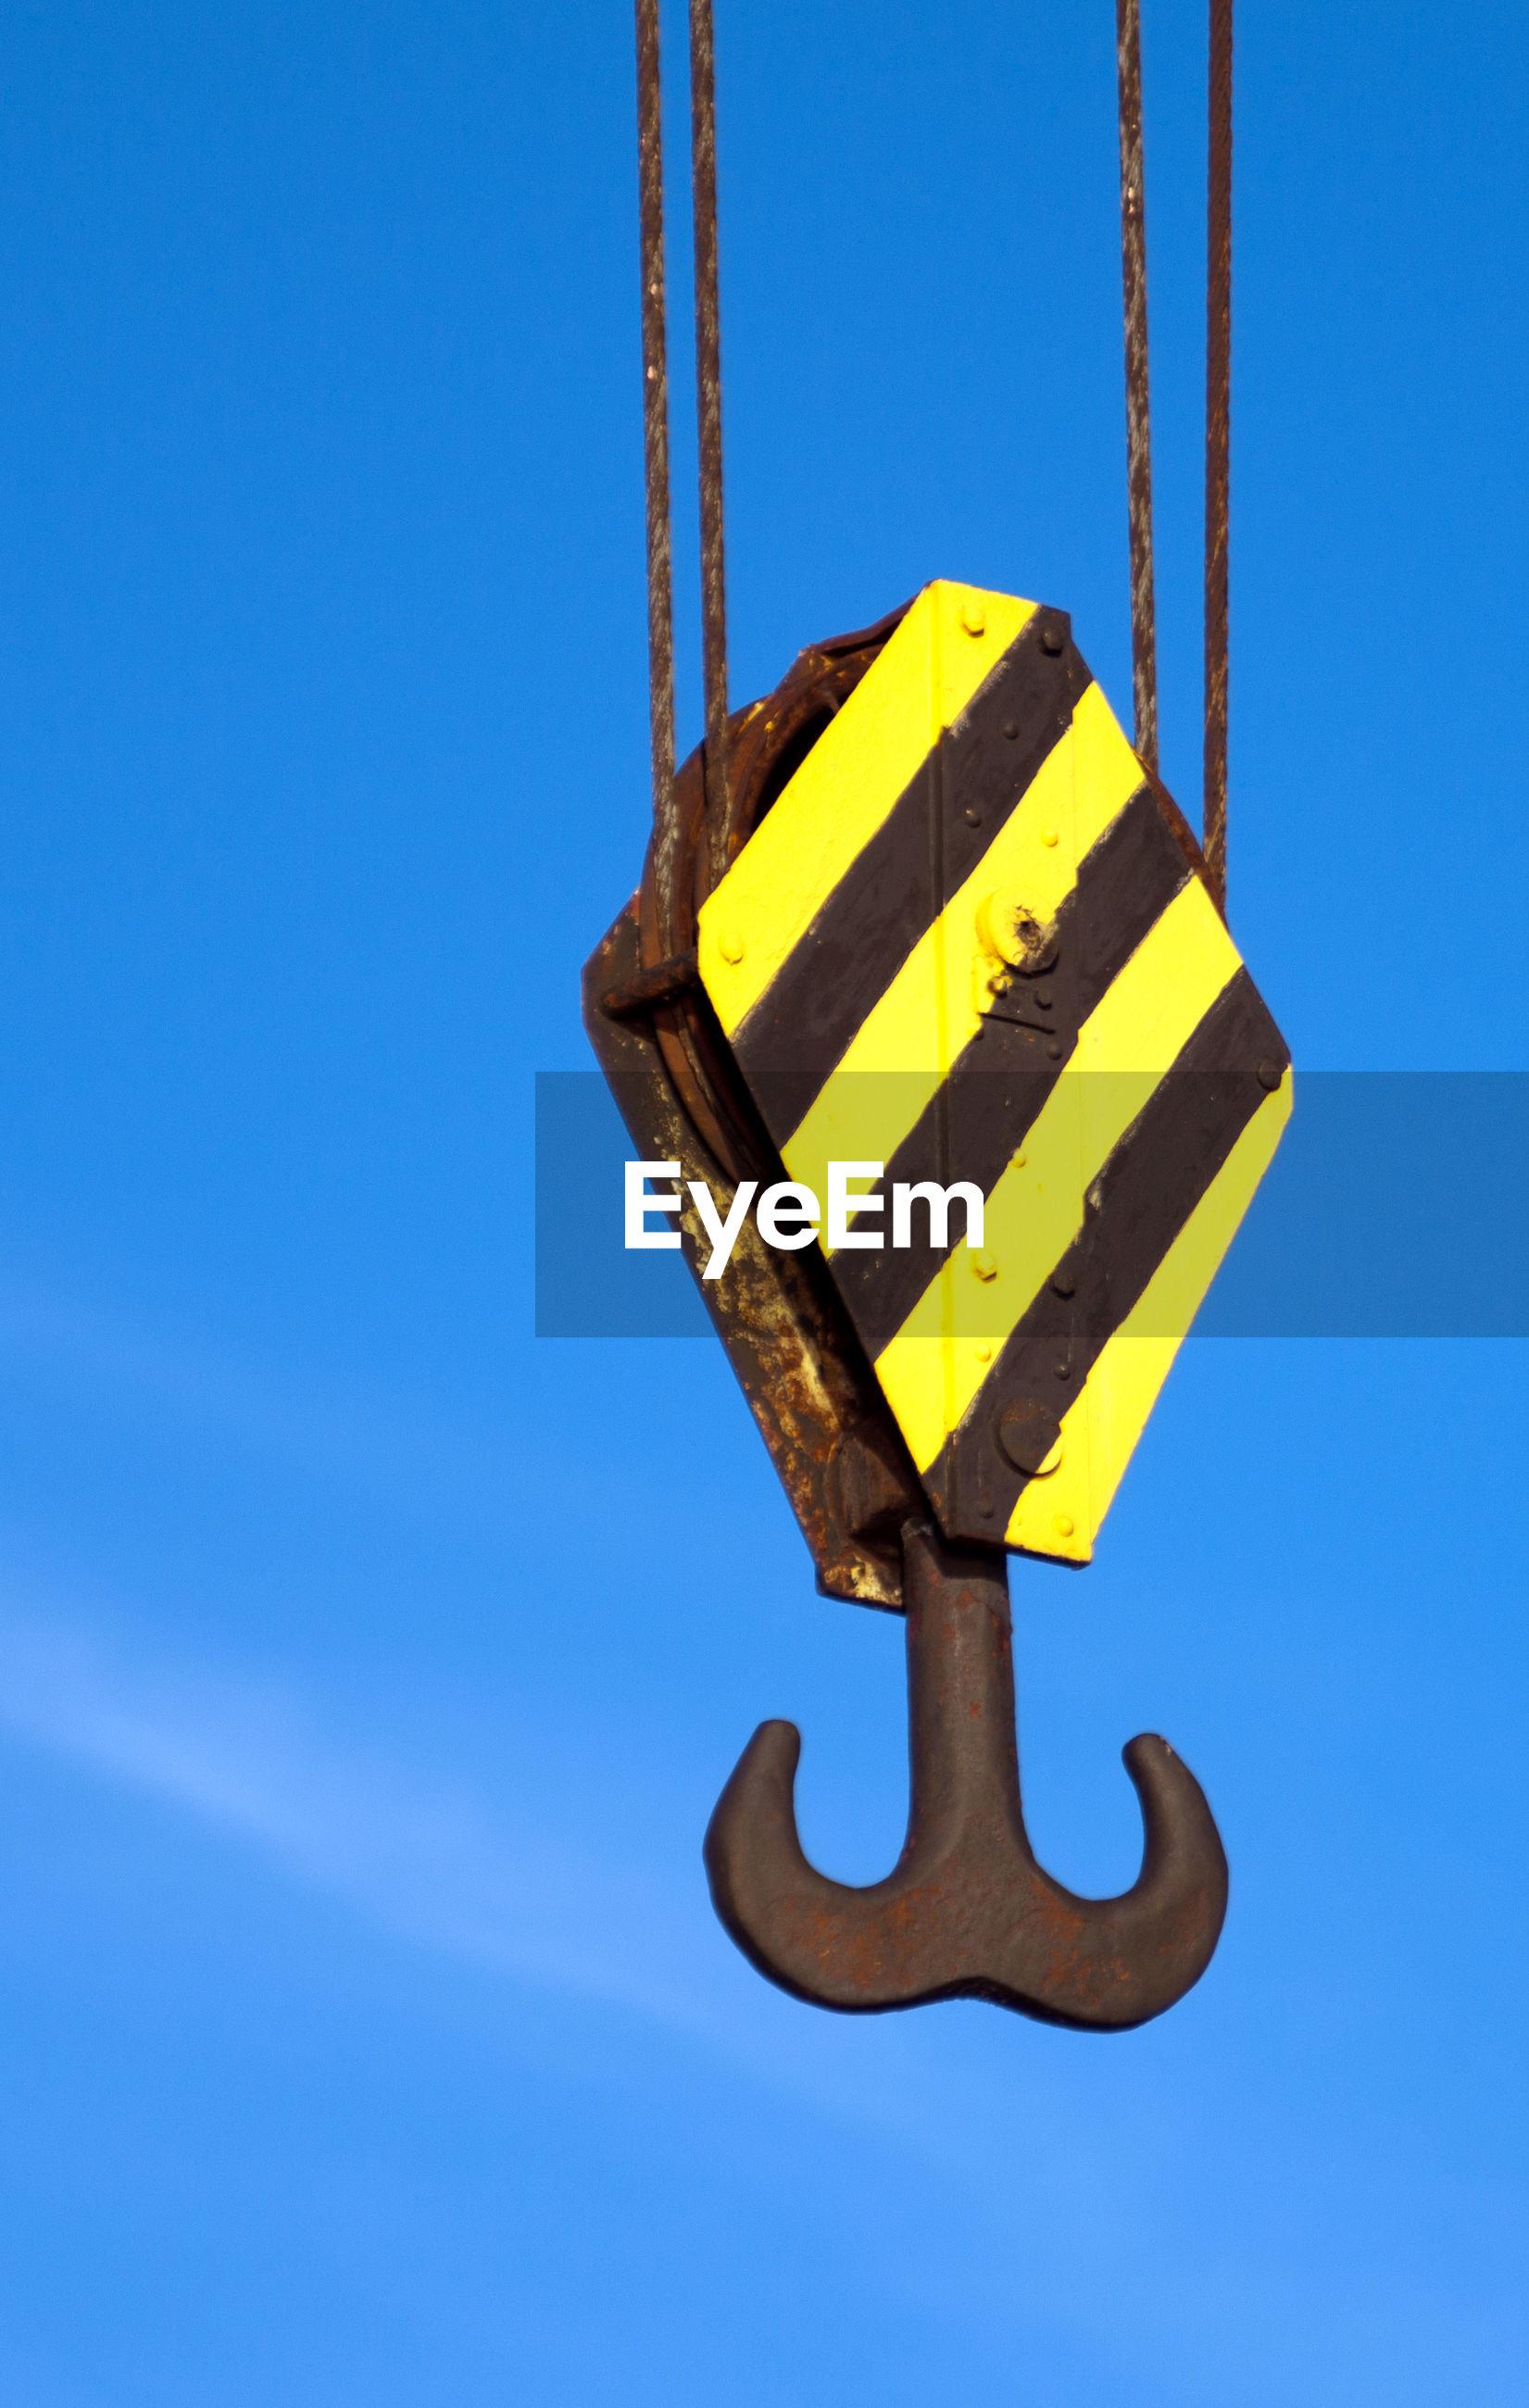 Hook of crane against blue sky